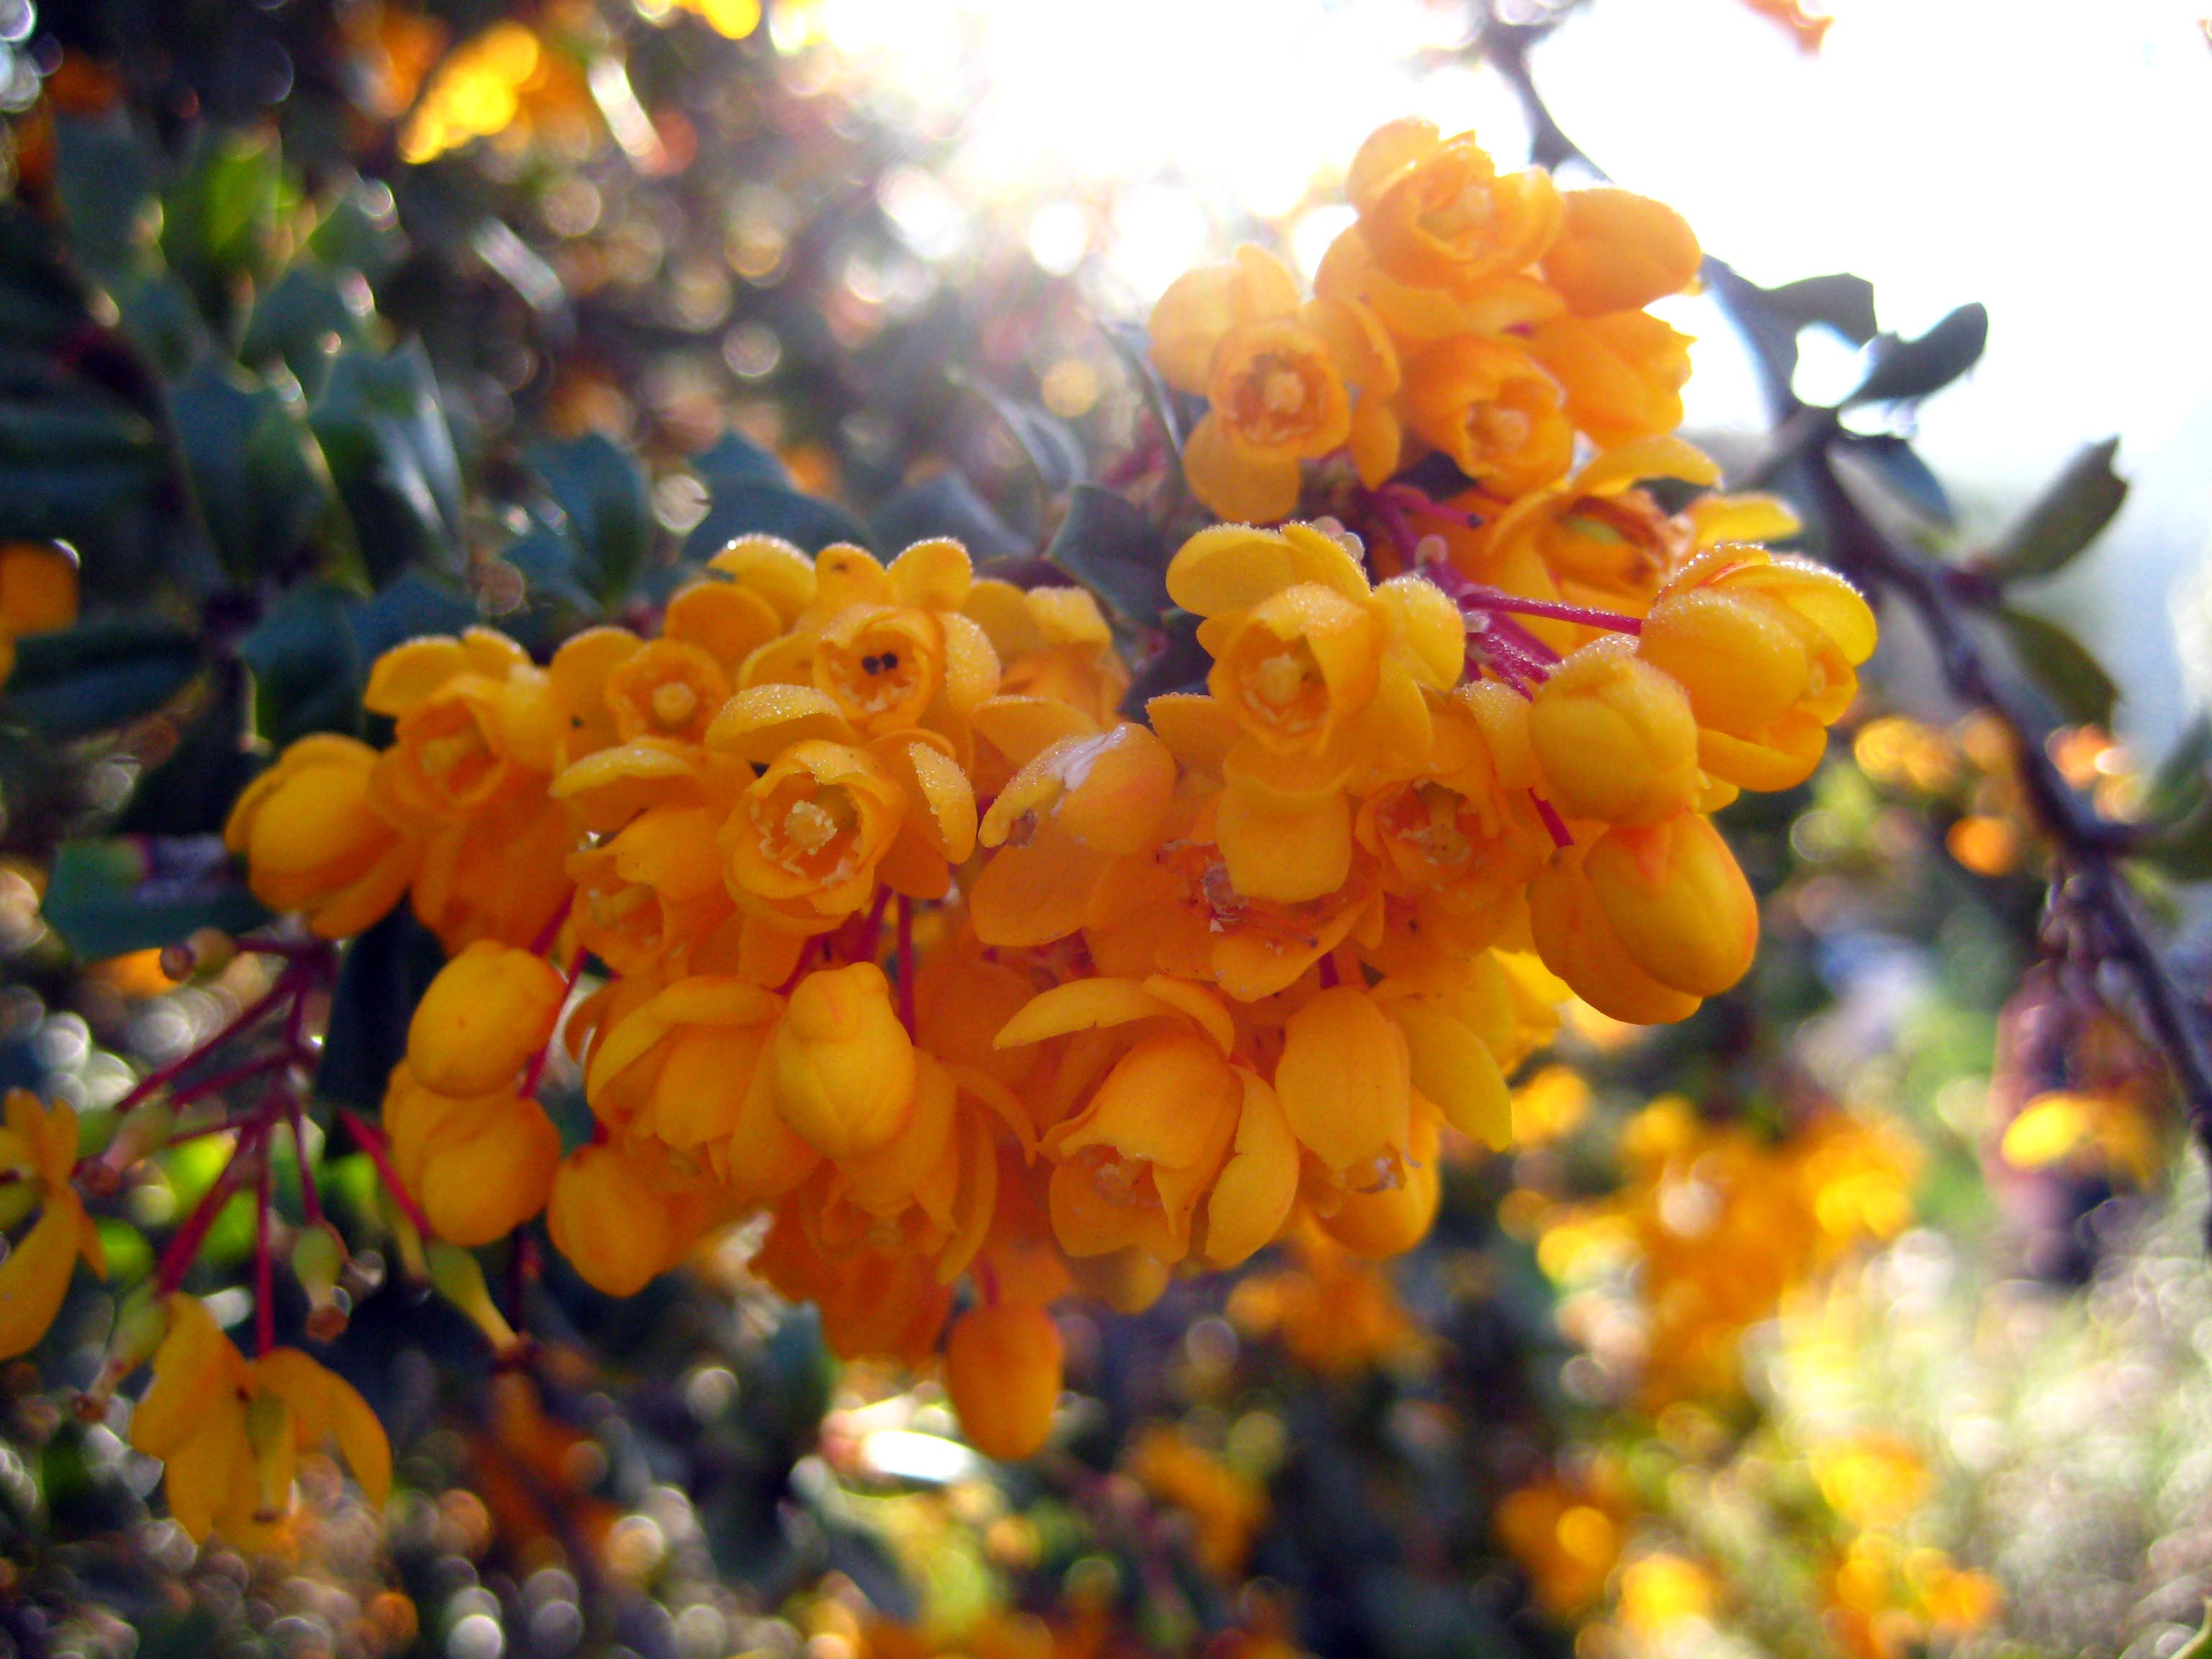 Darwin's barberry (Berberis darwinii) flowers